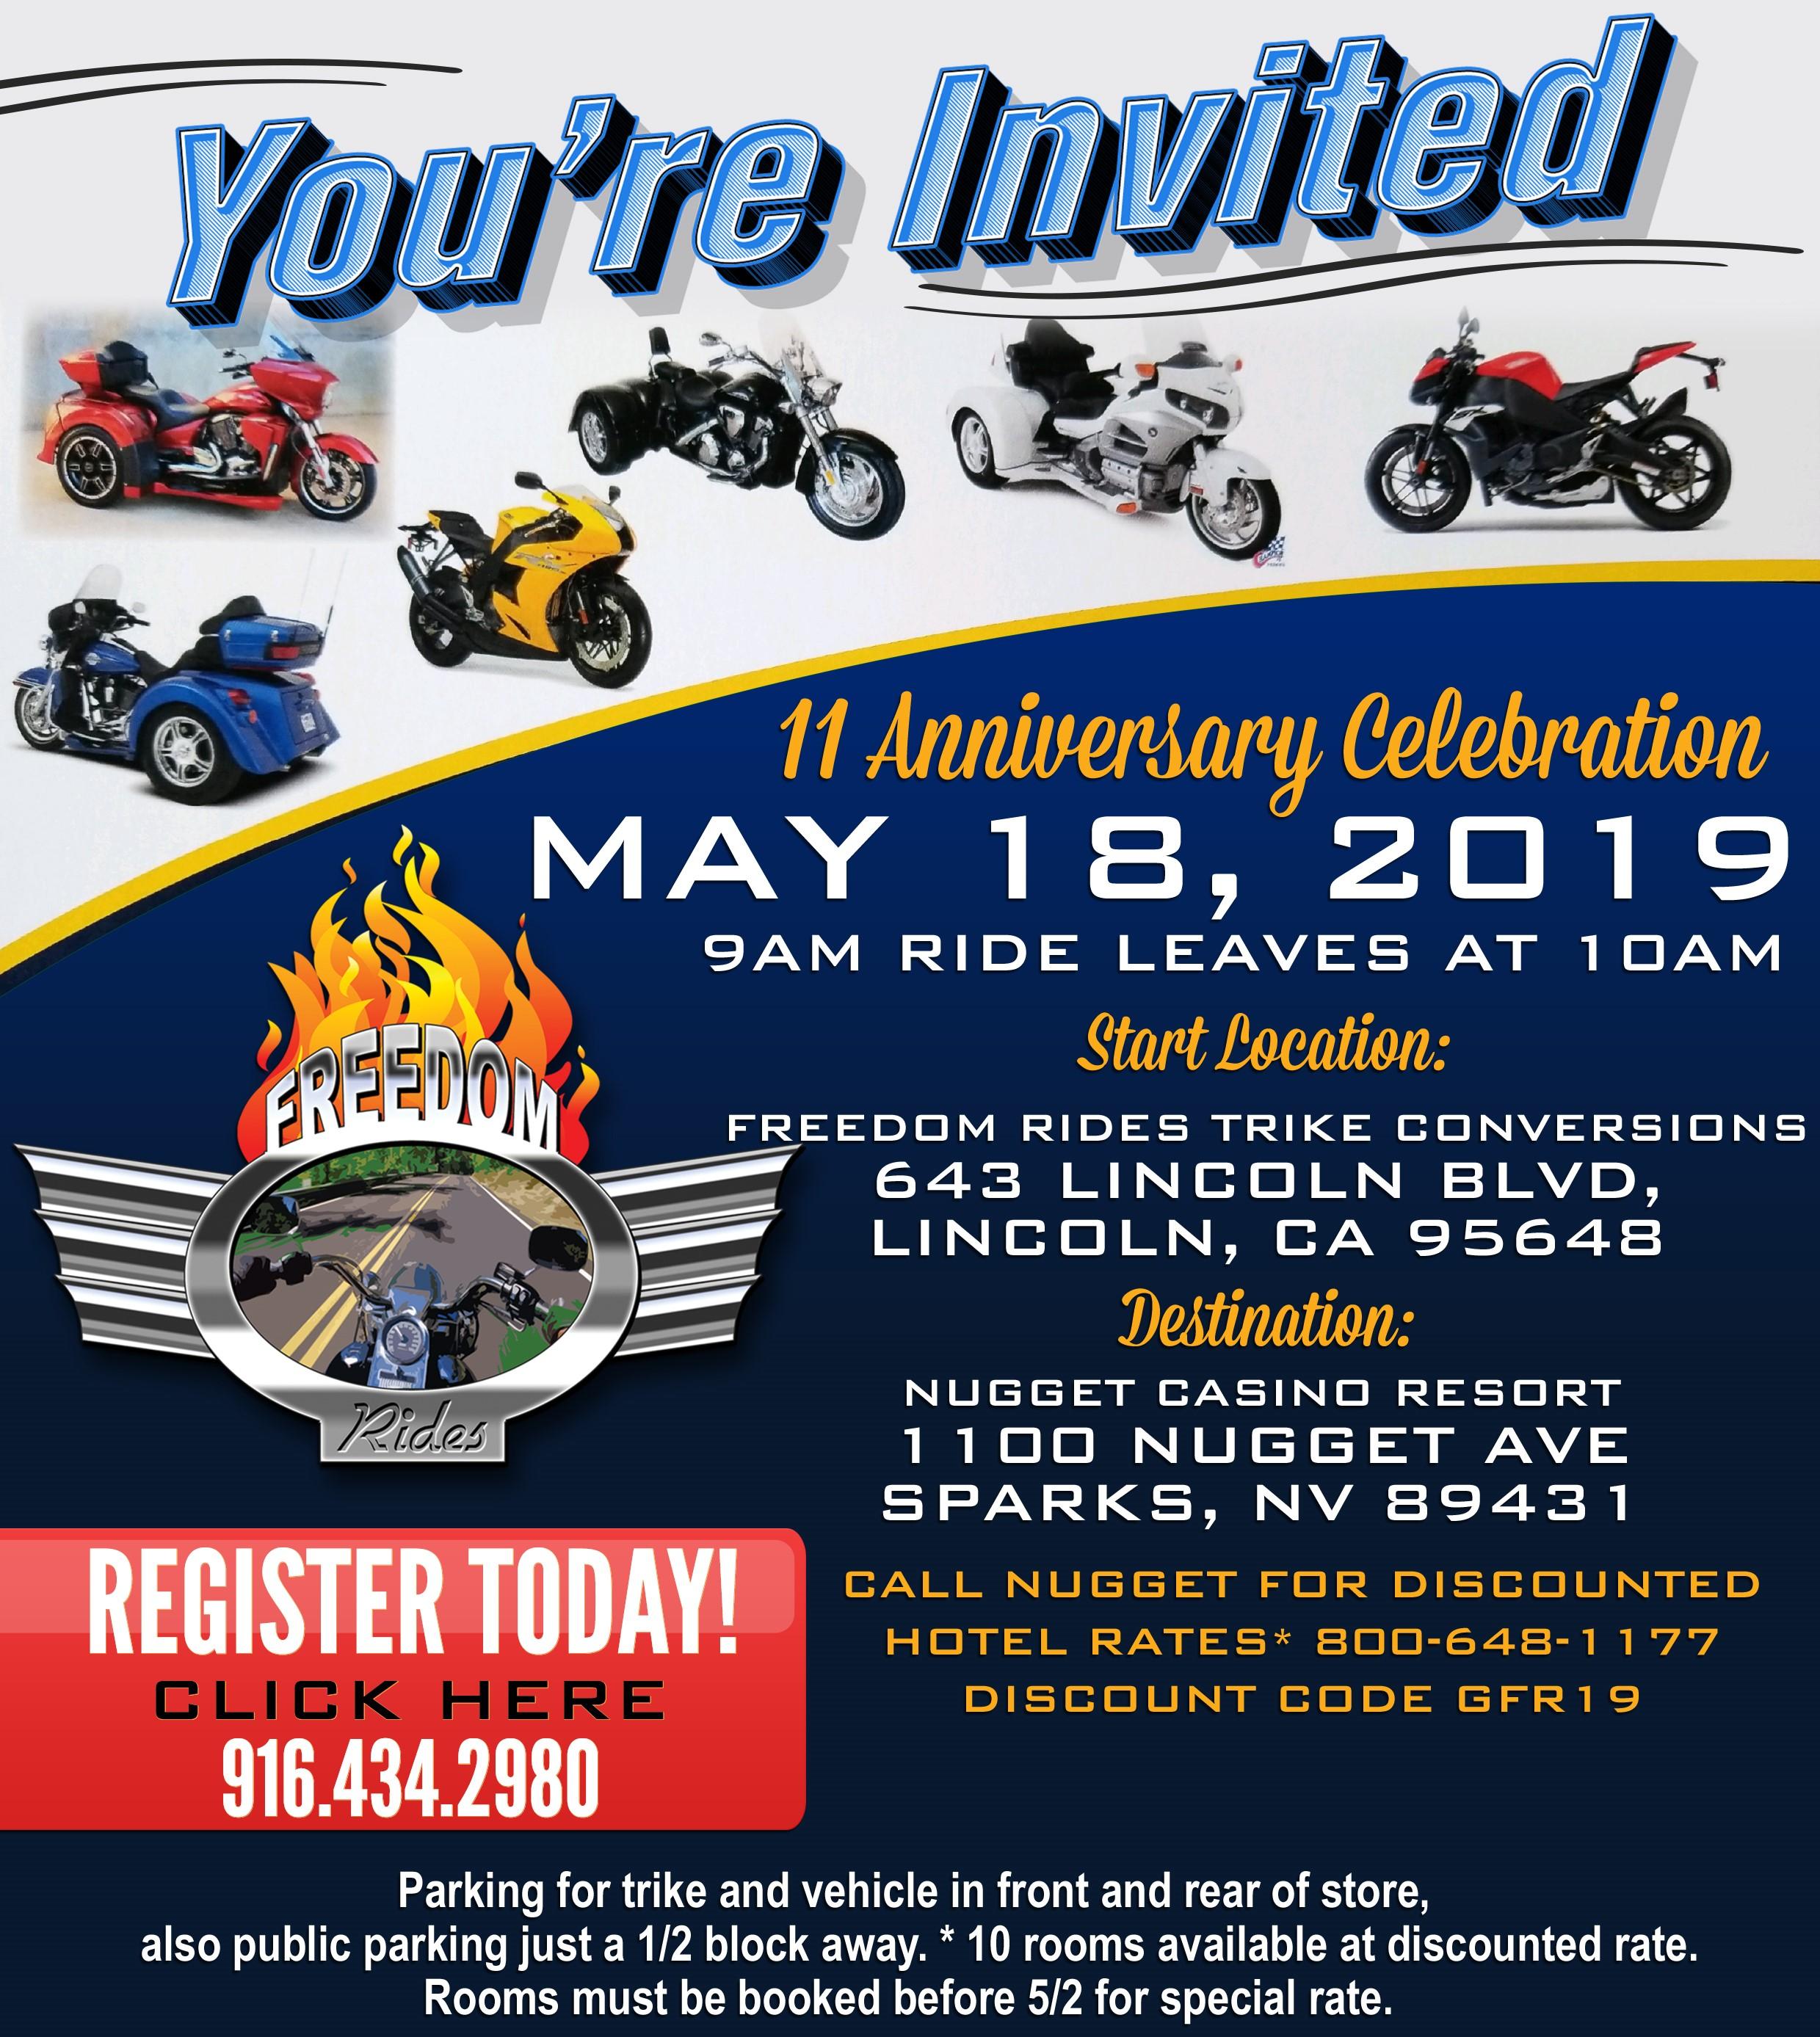 11th Anniversary Celebration at Freedom Rides